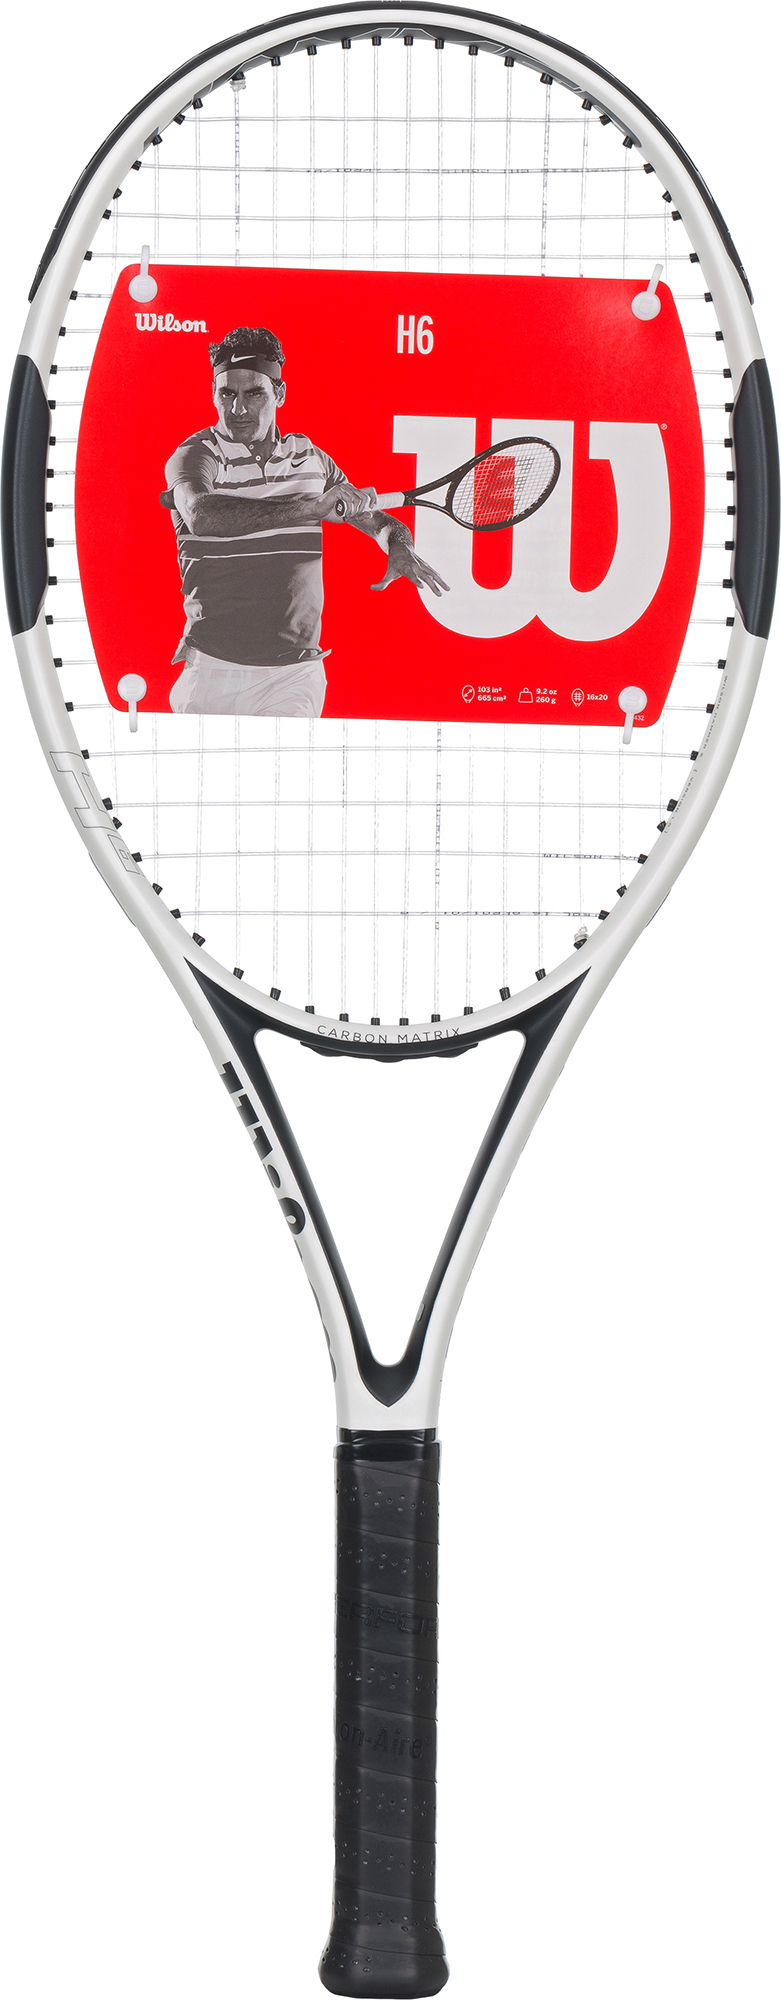 Wilson Ракетка для большого тенниса Wilson H6, размер 3 wilson ракетка для большого тенниса детская wilson roger federer 23 размер без размера